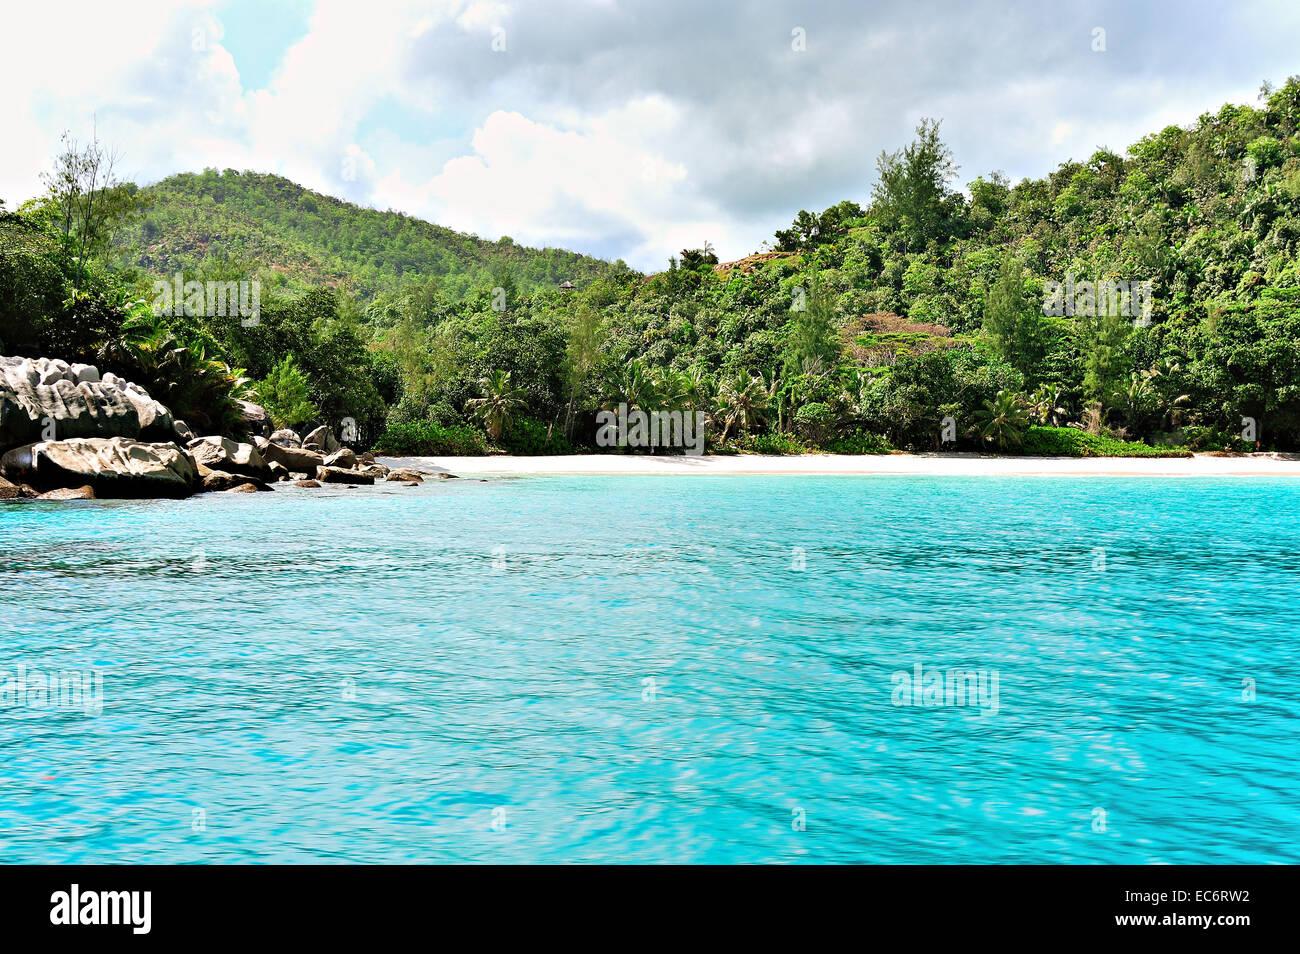 Profundas aguas azules y arena, Anse Georgette, Praslin, Seychelles Imagen De Stock